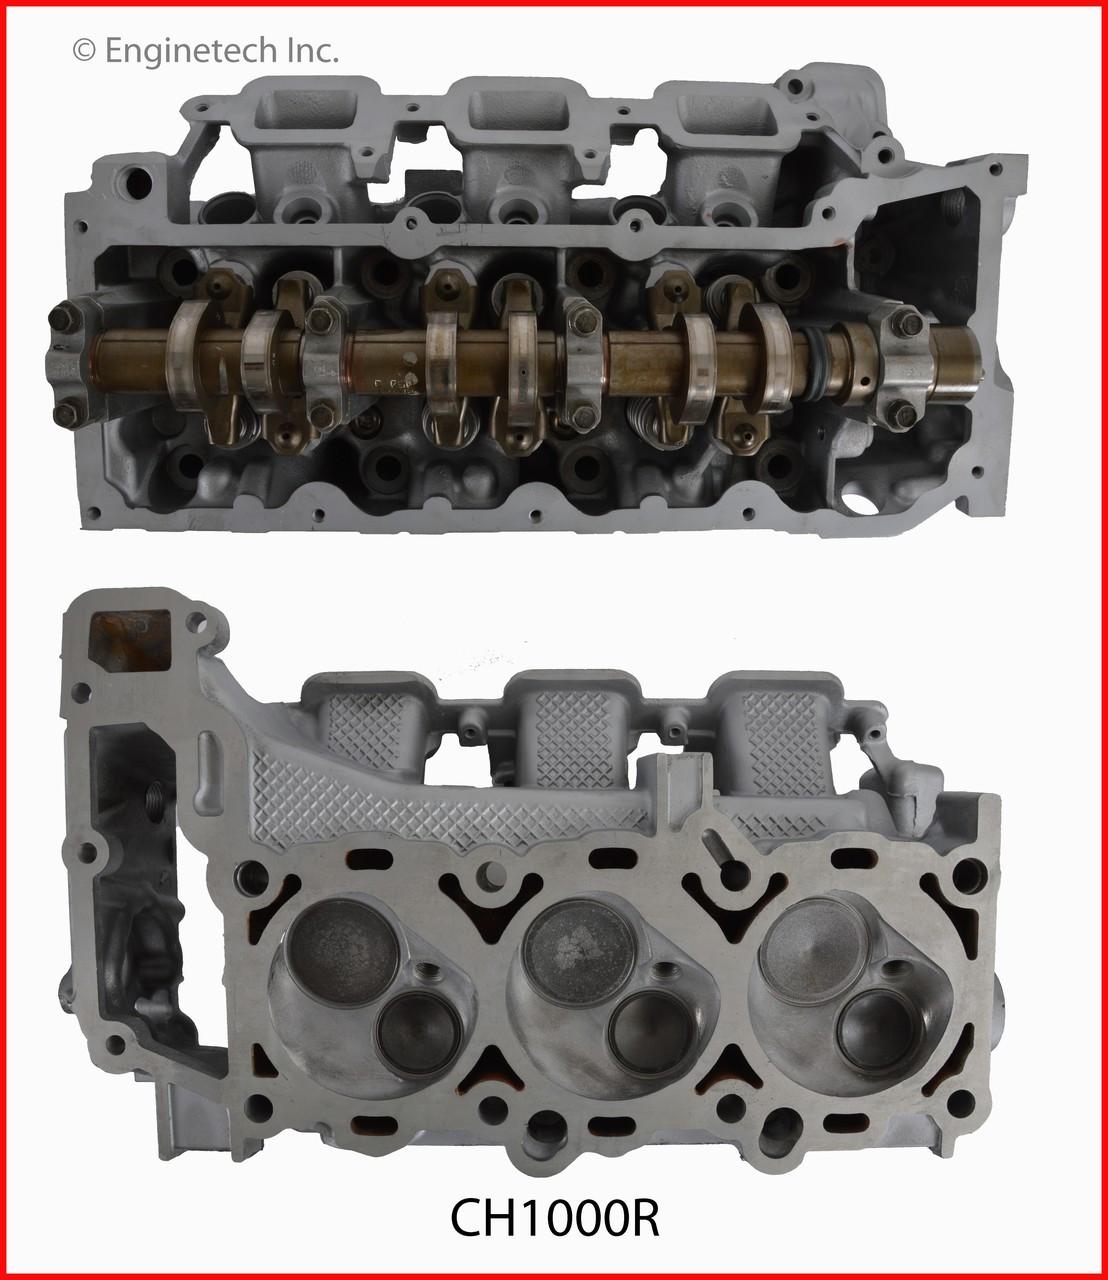 2004 Dodge Durango 3 7l Engine Cylinder Head Assembly Ch1000r 6